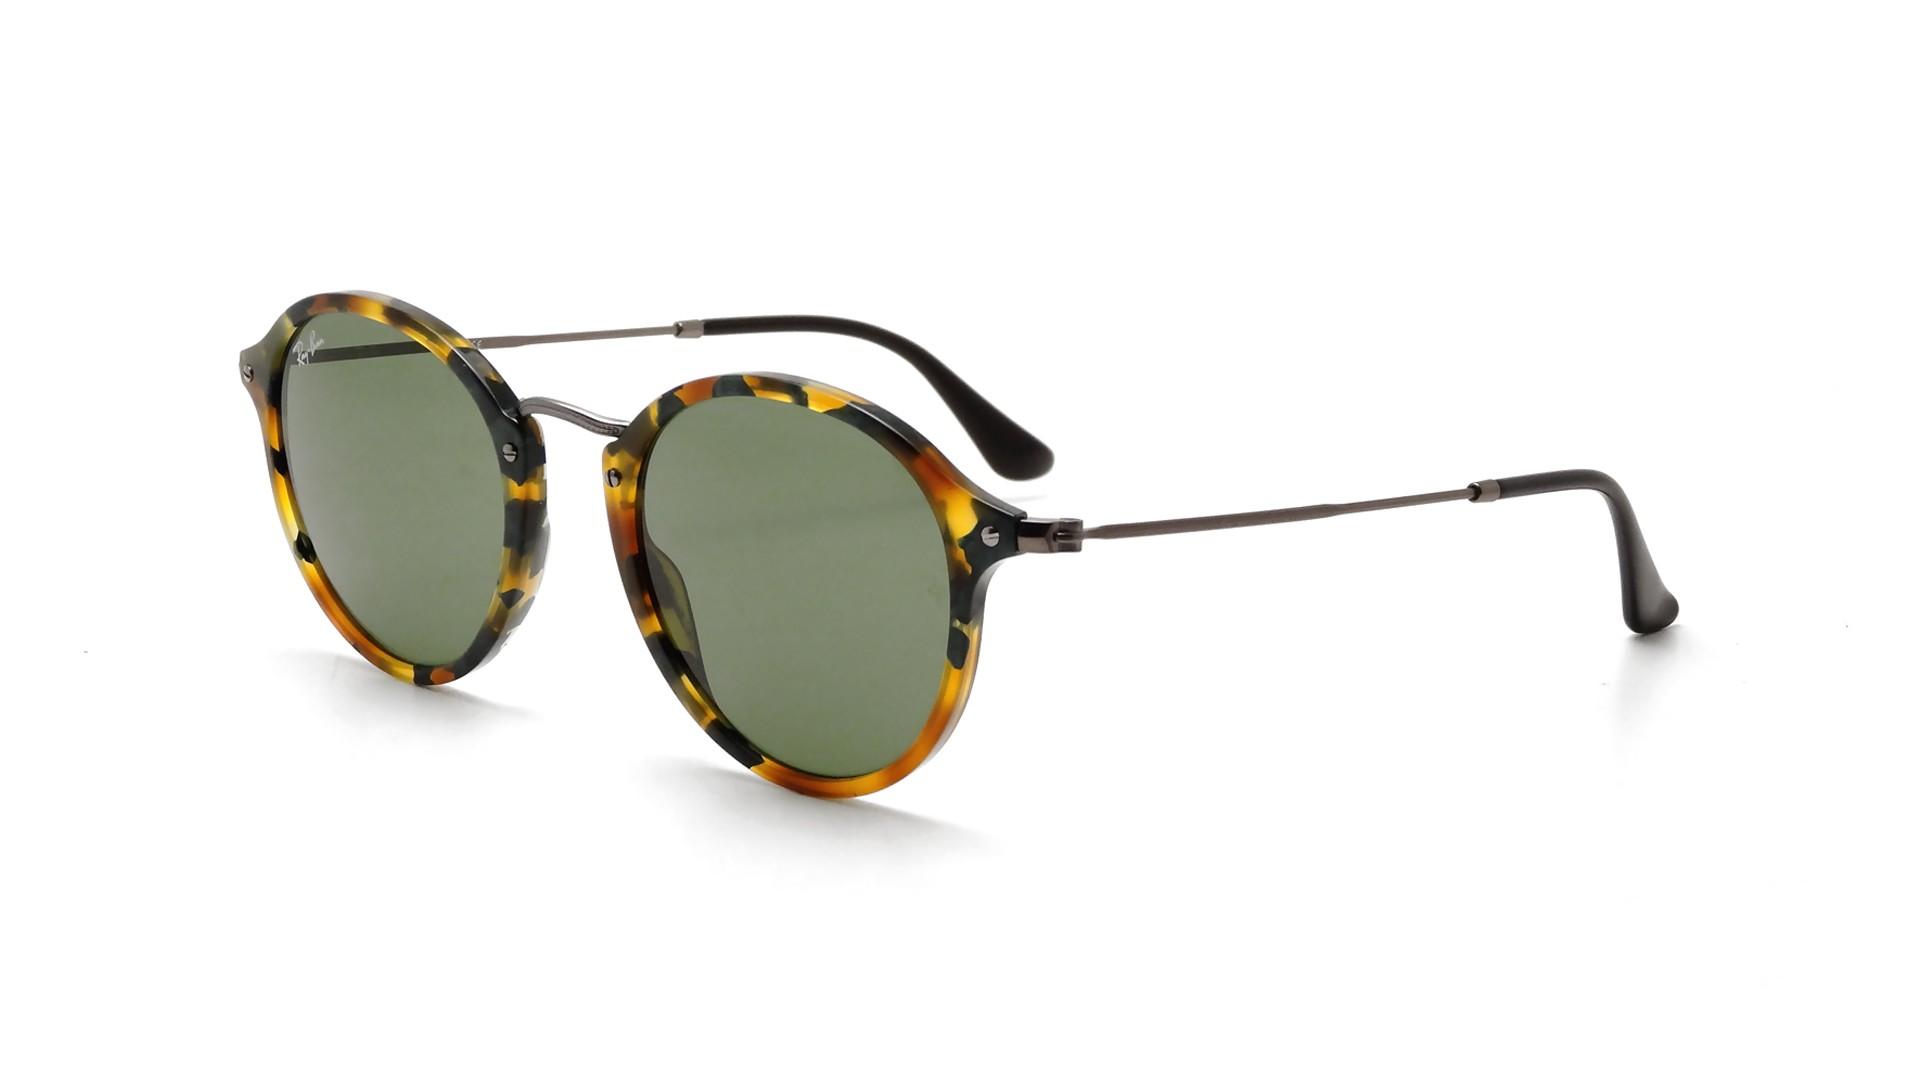 7e5e7e196e0 Sunglasses Ray-Ban Round Fleck Tortoise RB2447 1159 4E 49-21 Medium